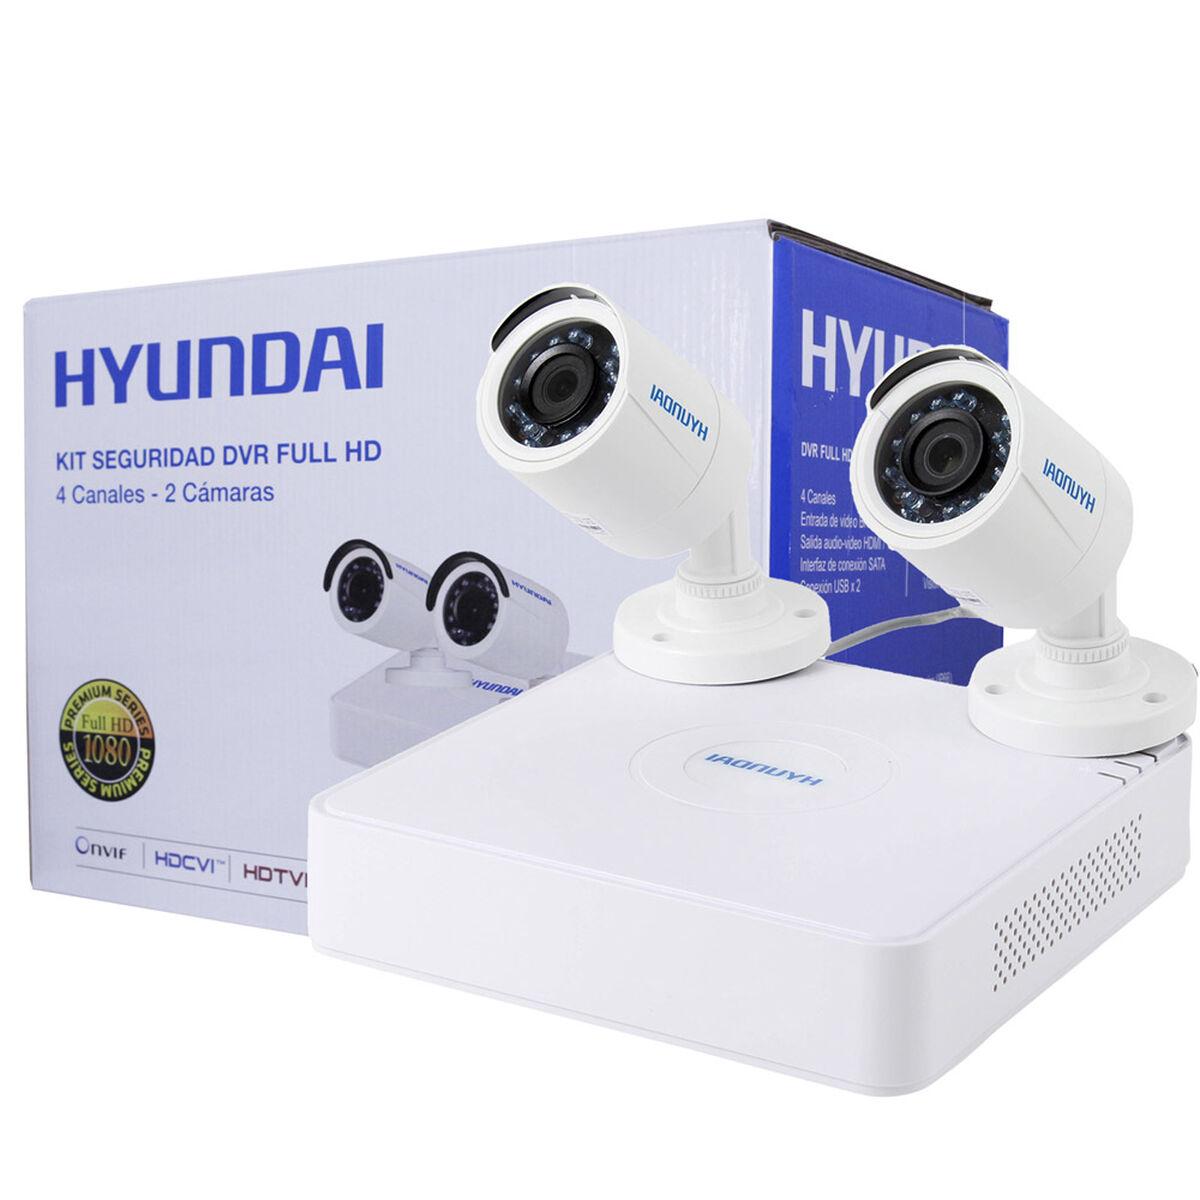 Kit 2 Cámaras de Seguridad Hyundai HY-DVR4CAM DVR Turbo